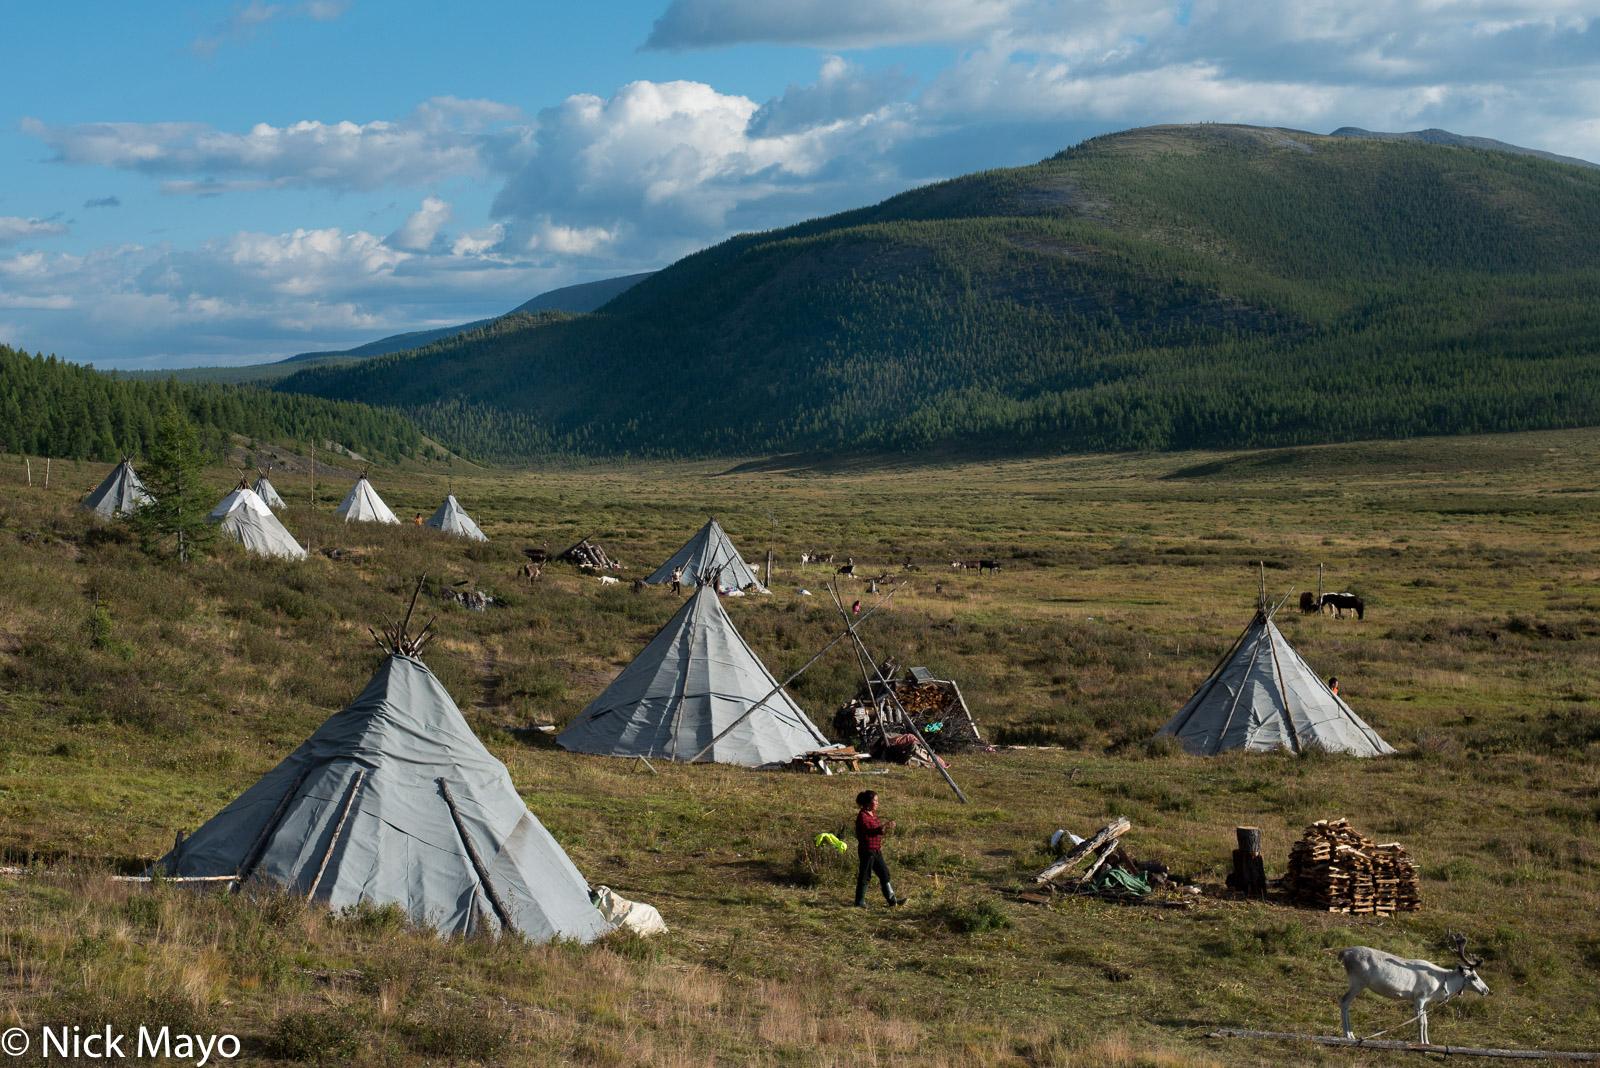 Dukha, Khovsgol, Mongolia, Reindeer, Tent, photo